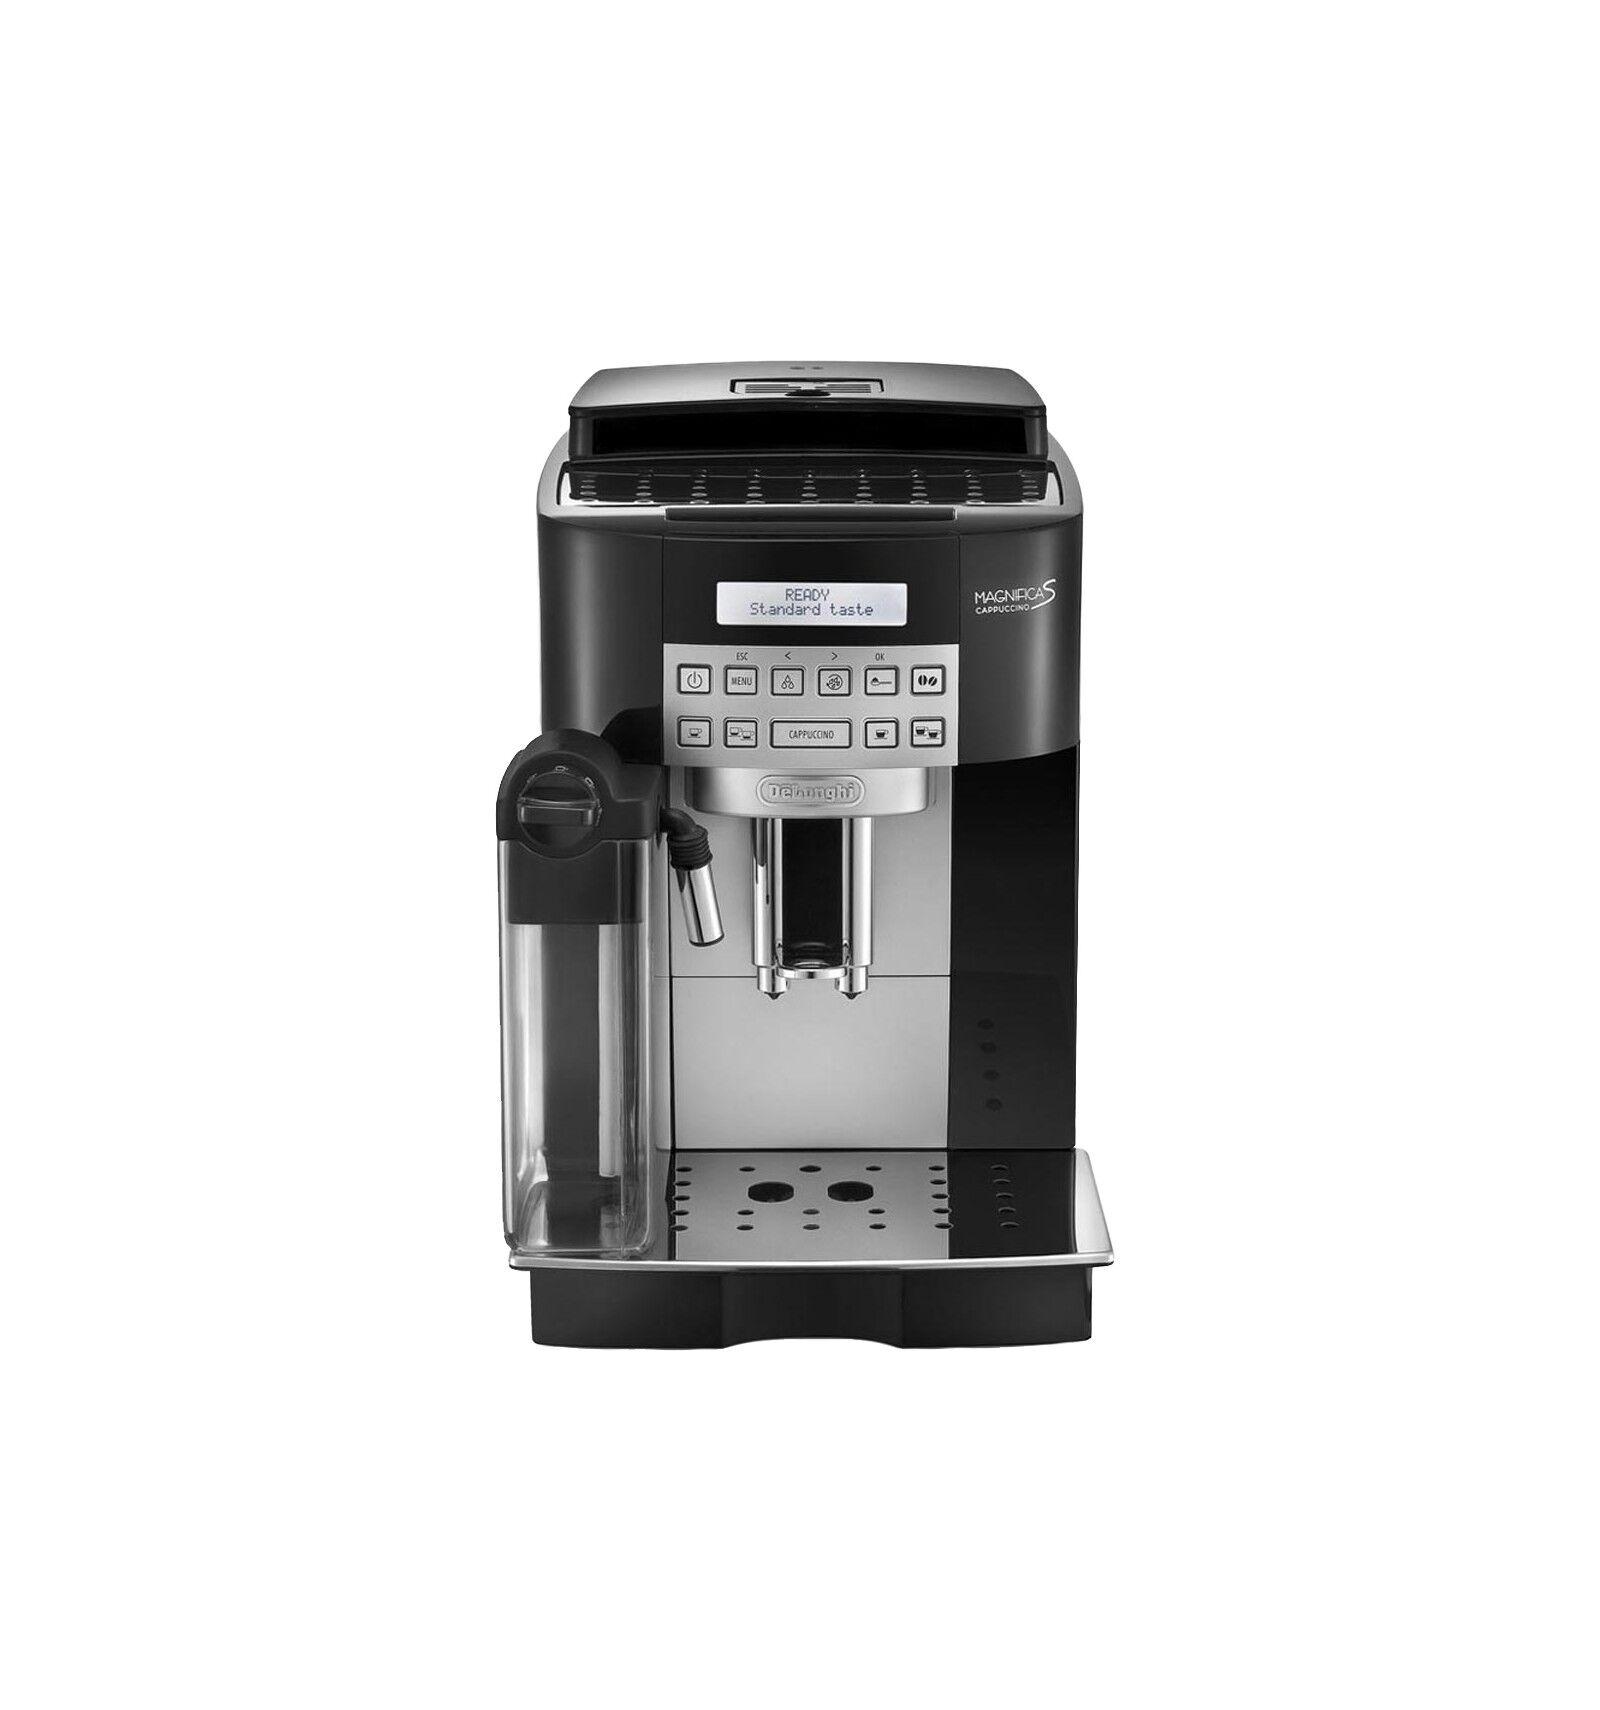 DeLonghi ECAM 45.766.B kahvinkeitin Espressokone 1,9 L Täysautomaattinen